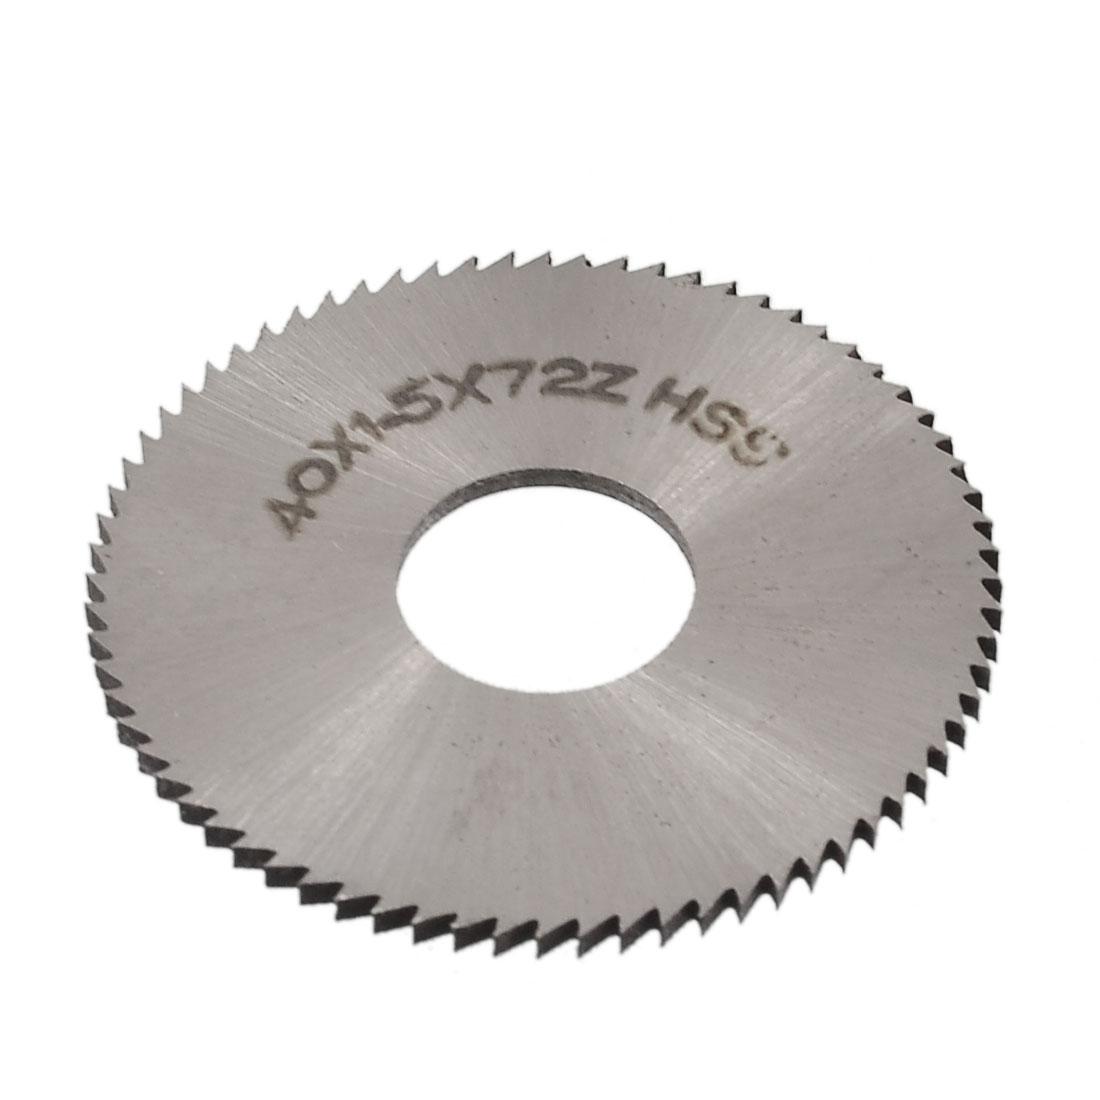 40mm x 1.5mm x 13mm 72T HSS Steel Round Slitting Saw Cutter